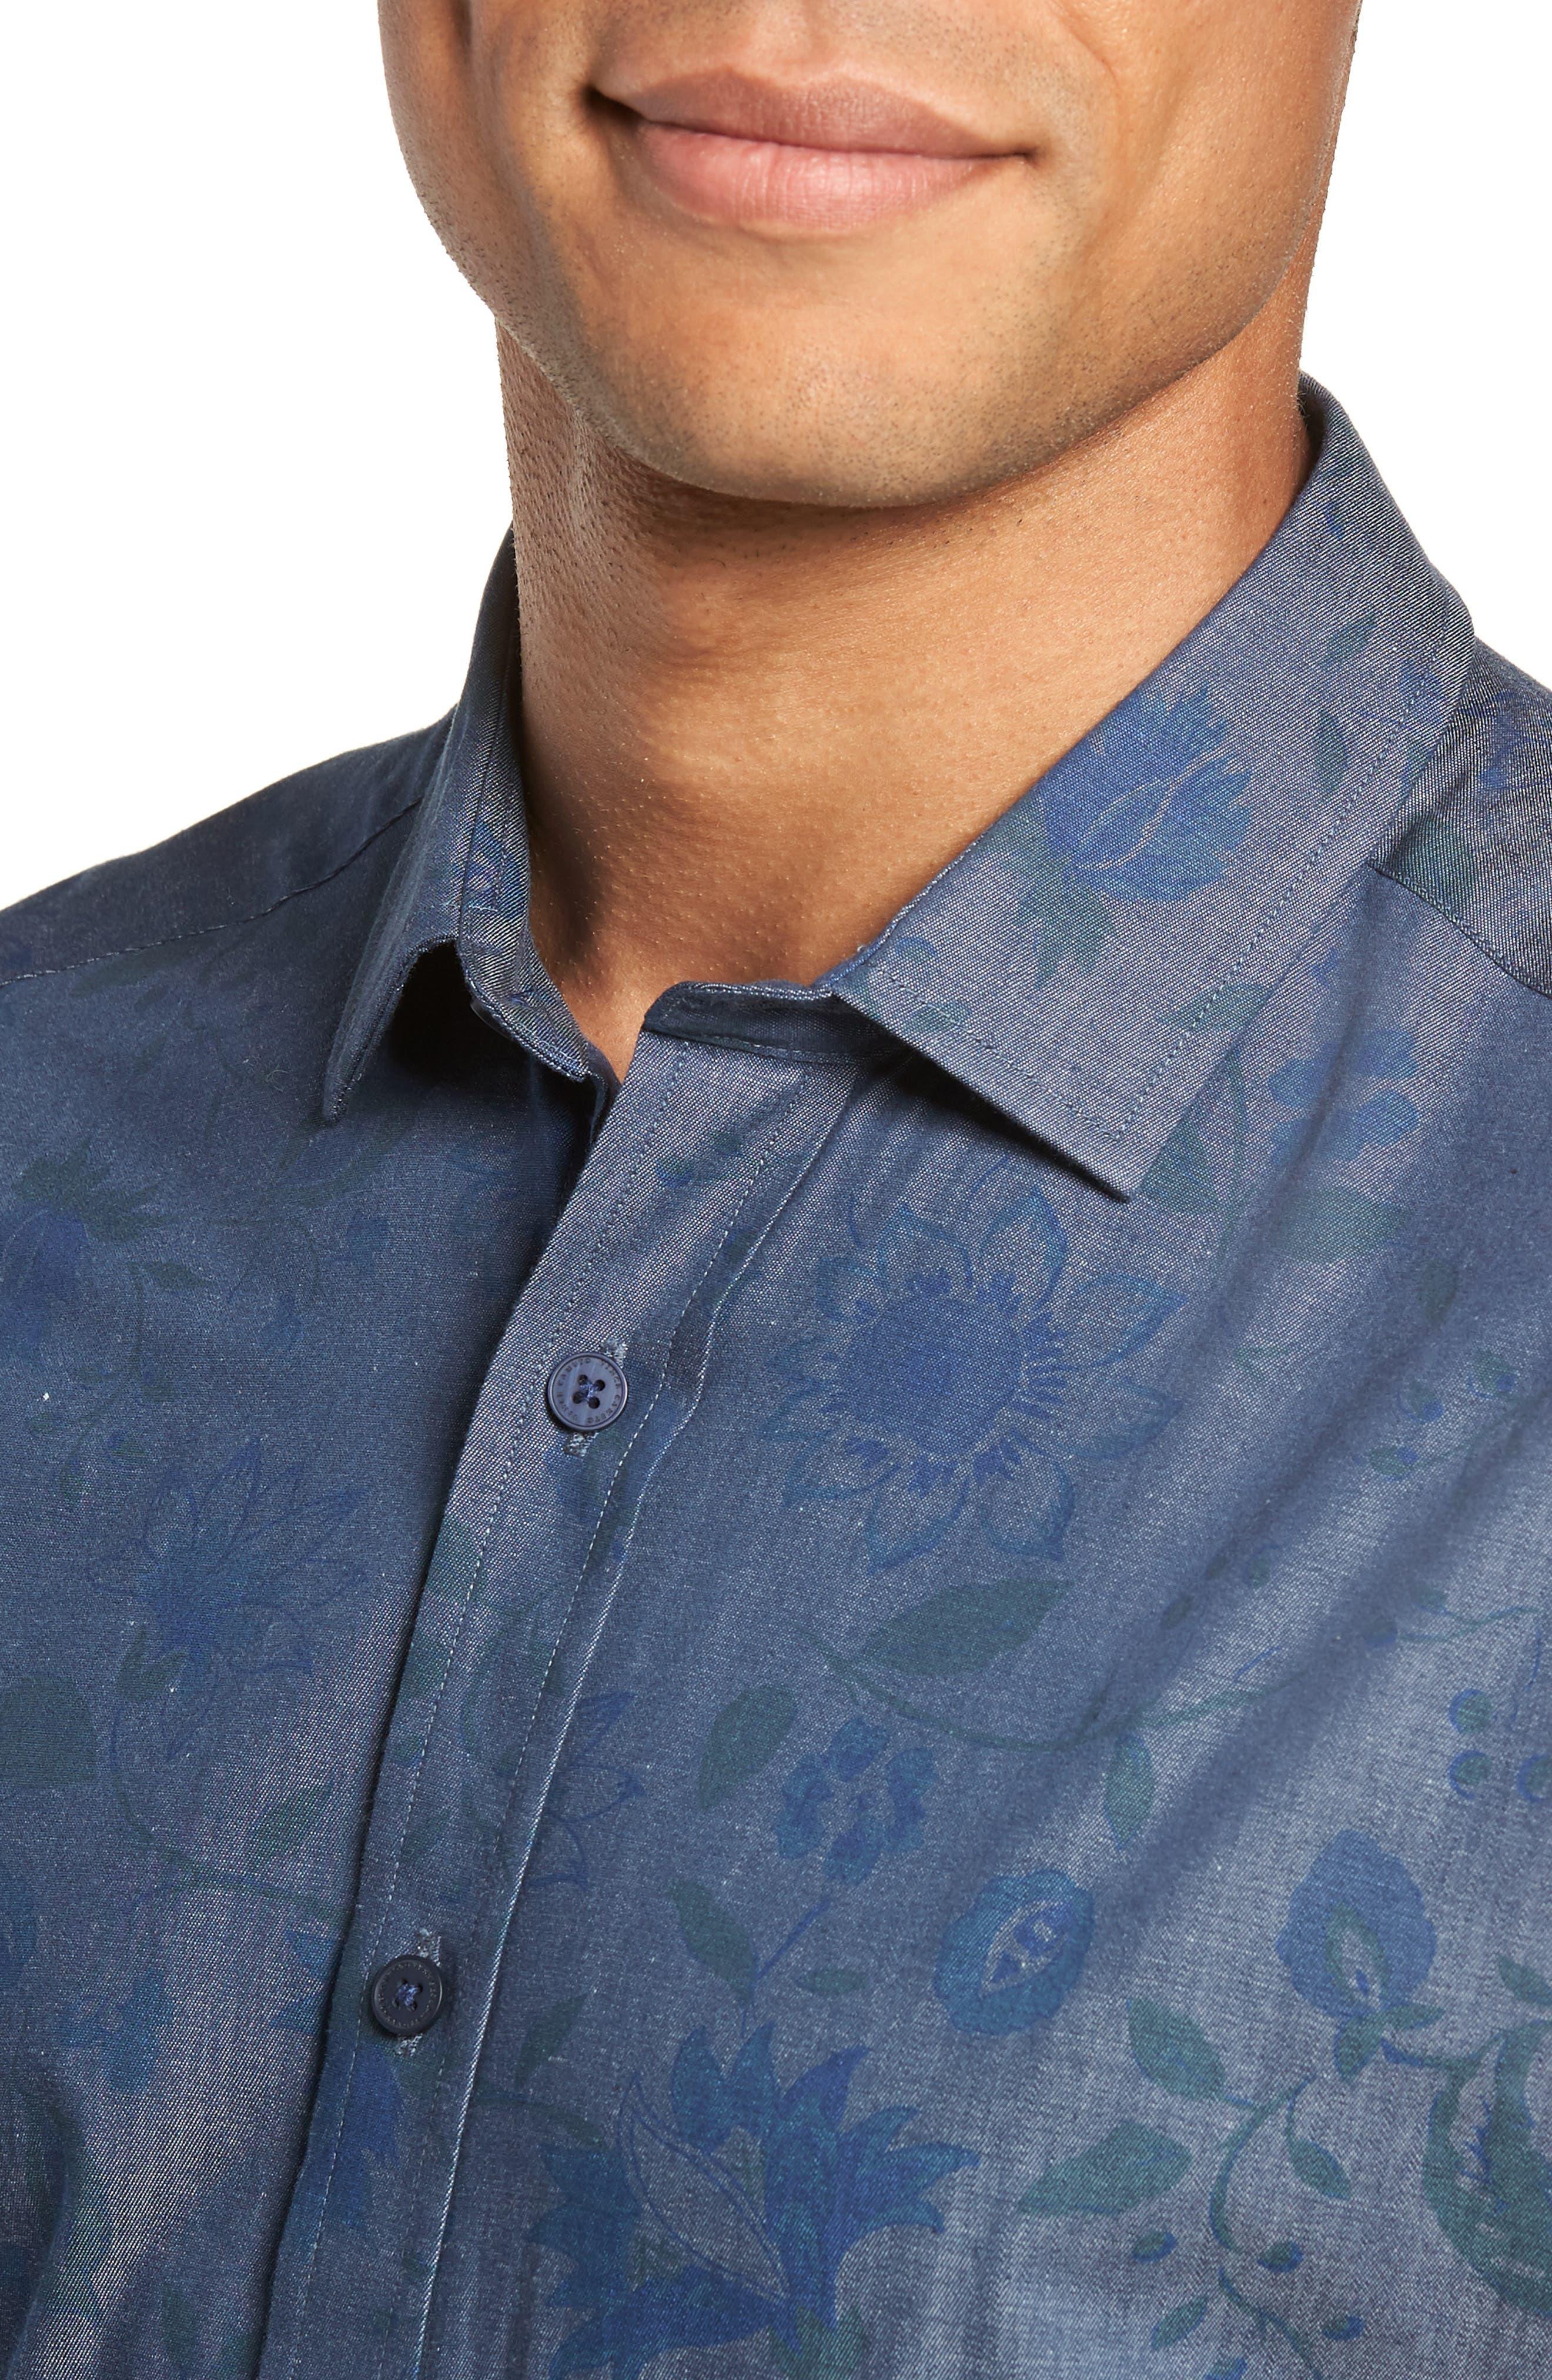 Slim Fit Floral Chambray Sport Shirt,                             Alternate thumbnail 2, color,                             INDIGO CHAMBRAY FLORAL PRINT